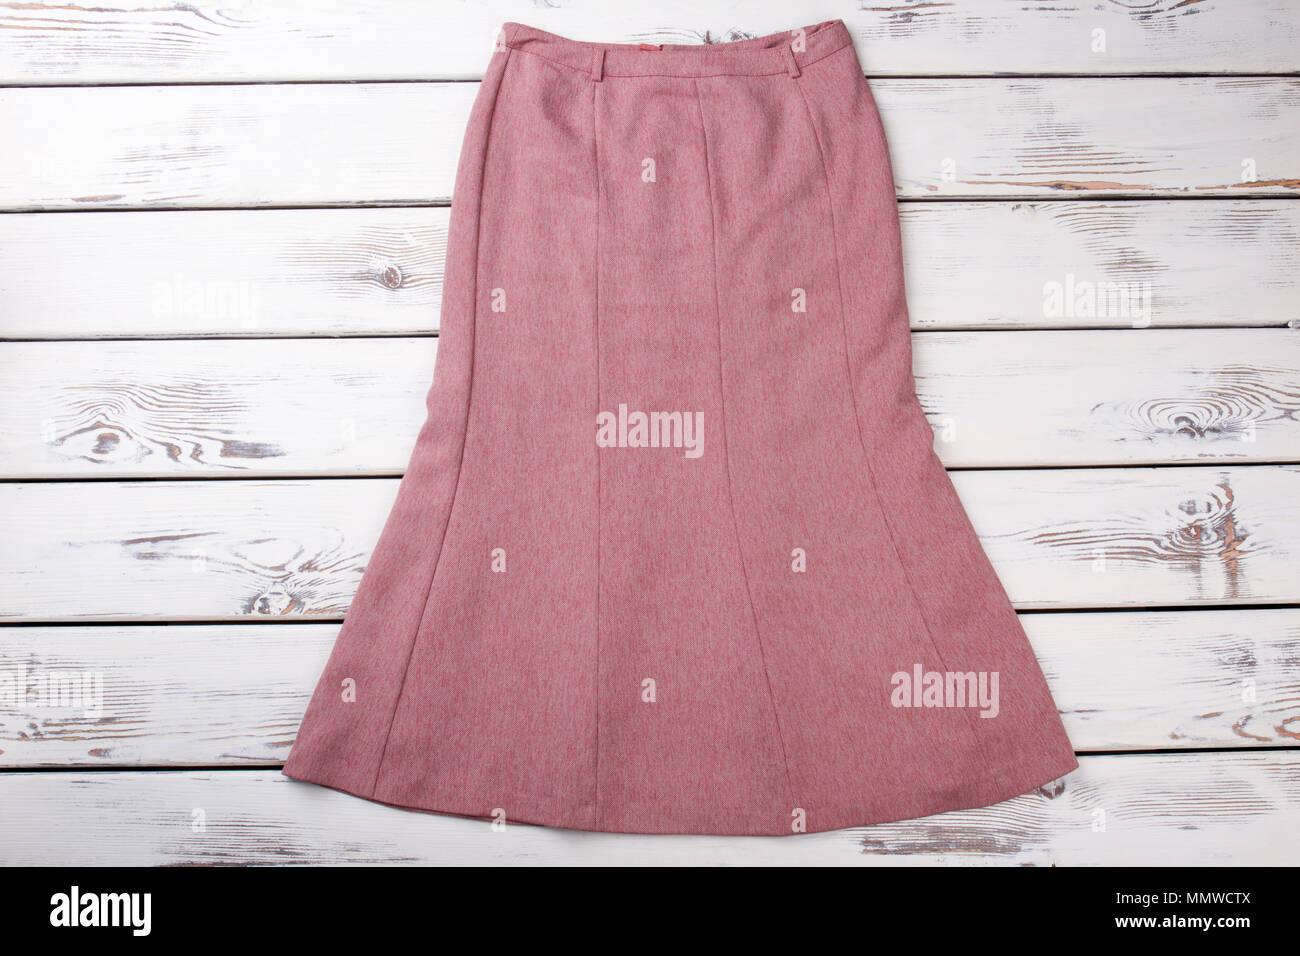 73690ded7b Textured Skirt Stock Photos & Textured Skirt Stock Images - Alamy